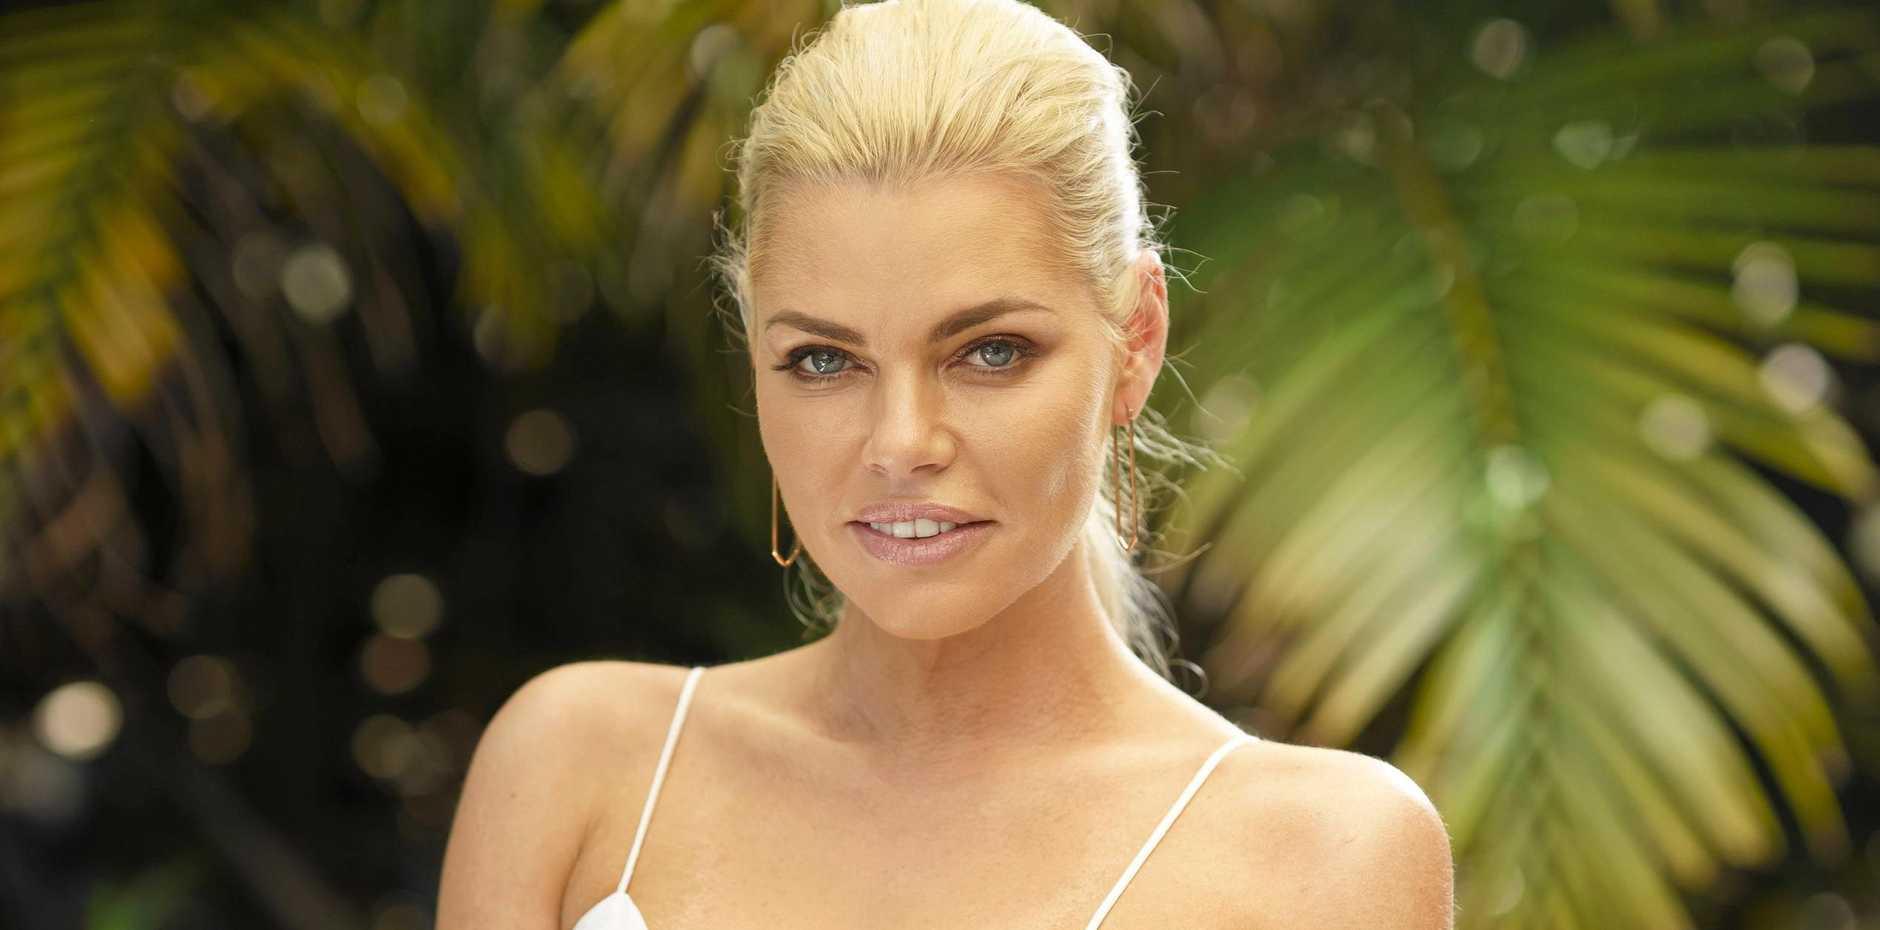 Sophie Monk will host the TV series Love Island Australia from Mallorca, Spain.